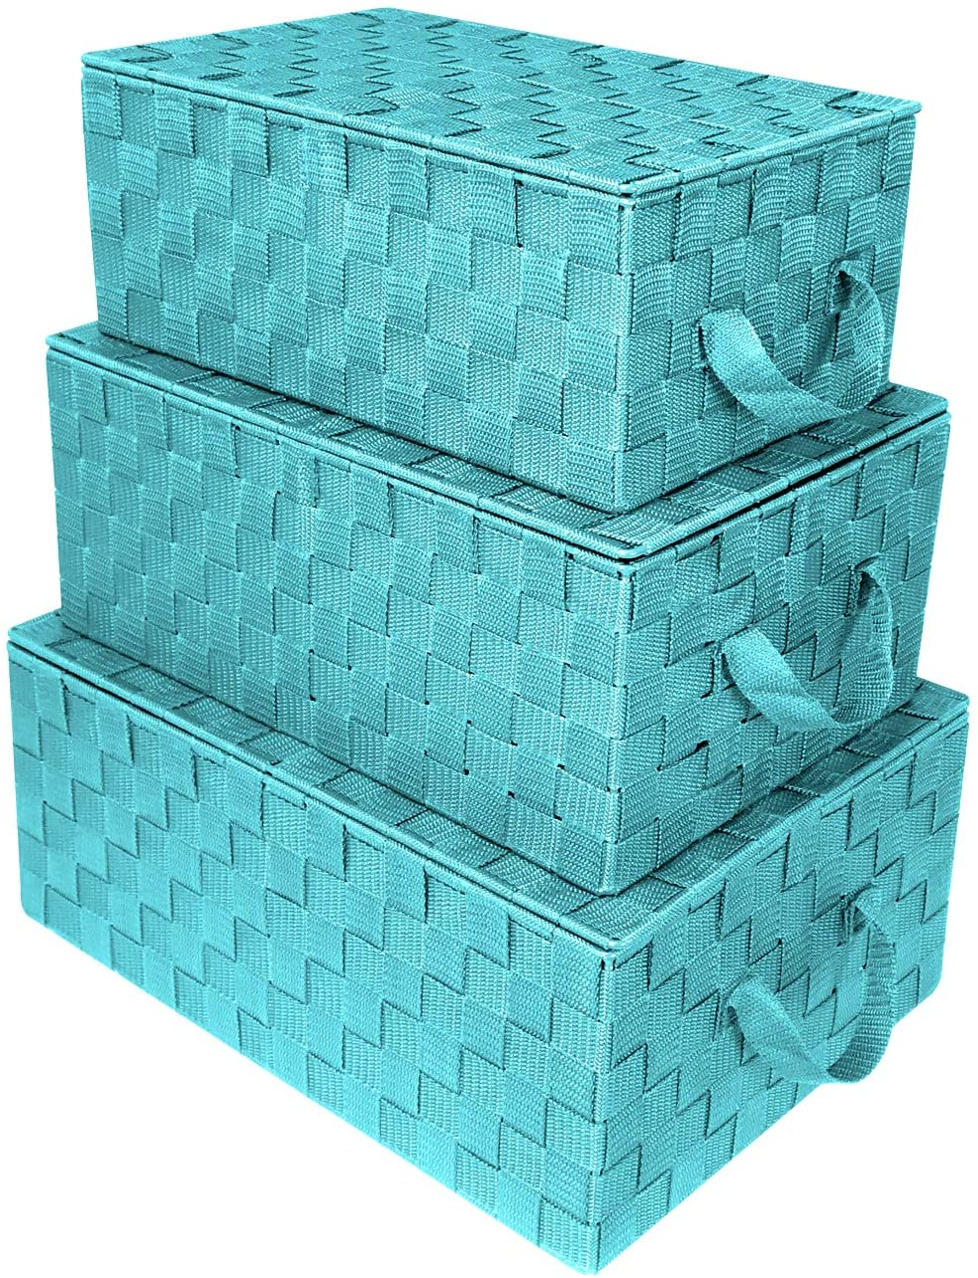 Sorbus Storage Box Woven Basket Bin Container Tote Cube Organizer Set Stackable Storage Basket Woven Strap Shelf Organizer Built-in Carry Handles (Woven Lid Baskets - Aqua)